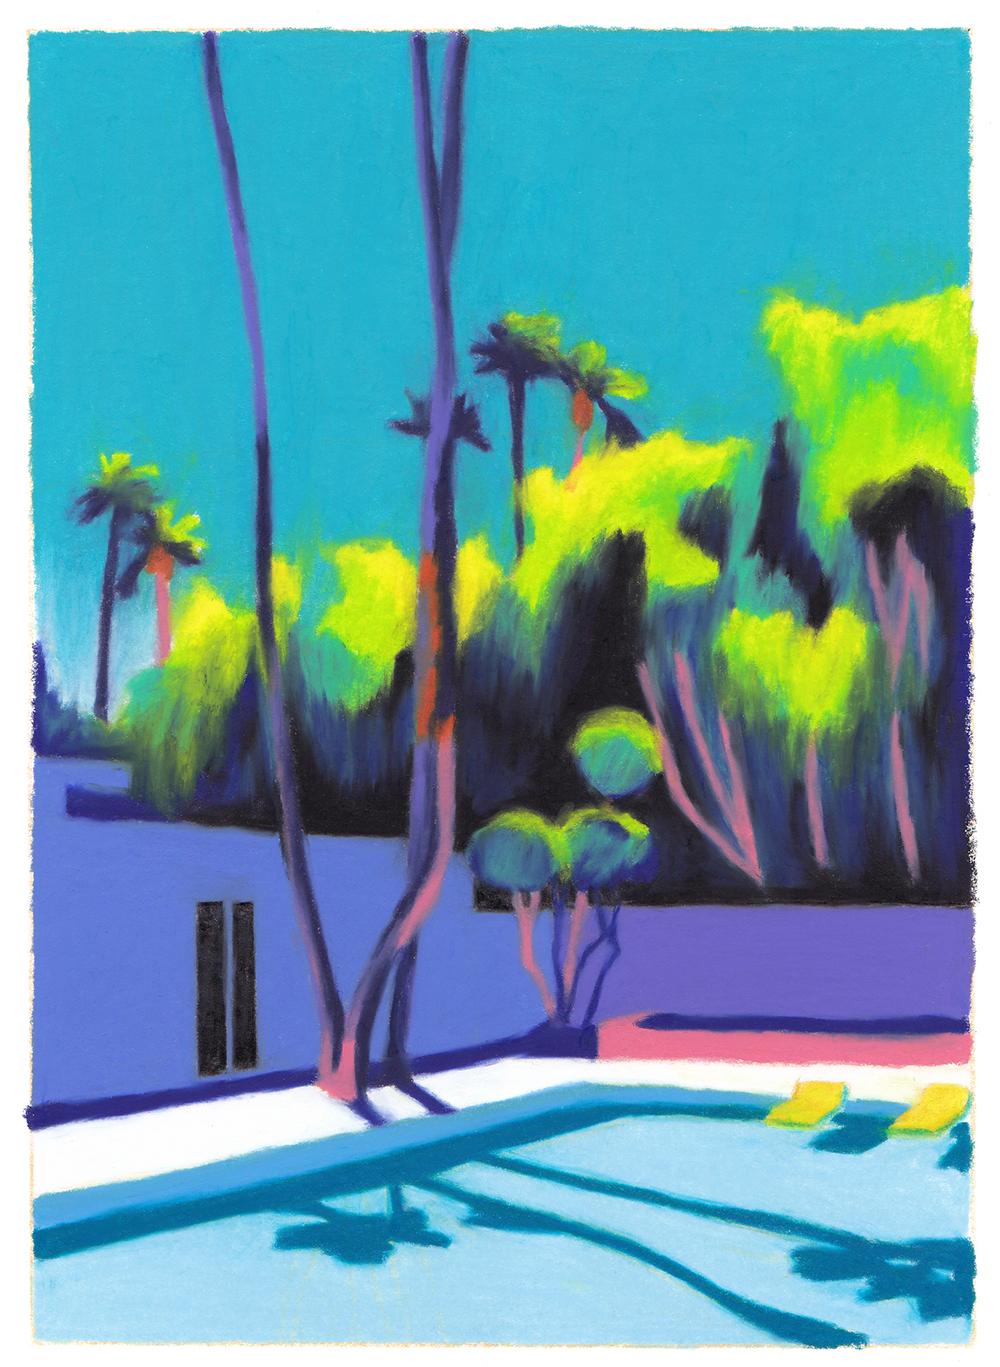 villa piscine arbres palmiers